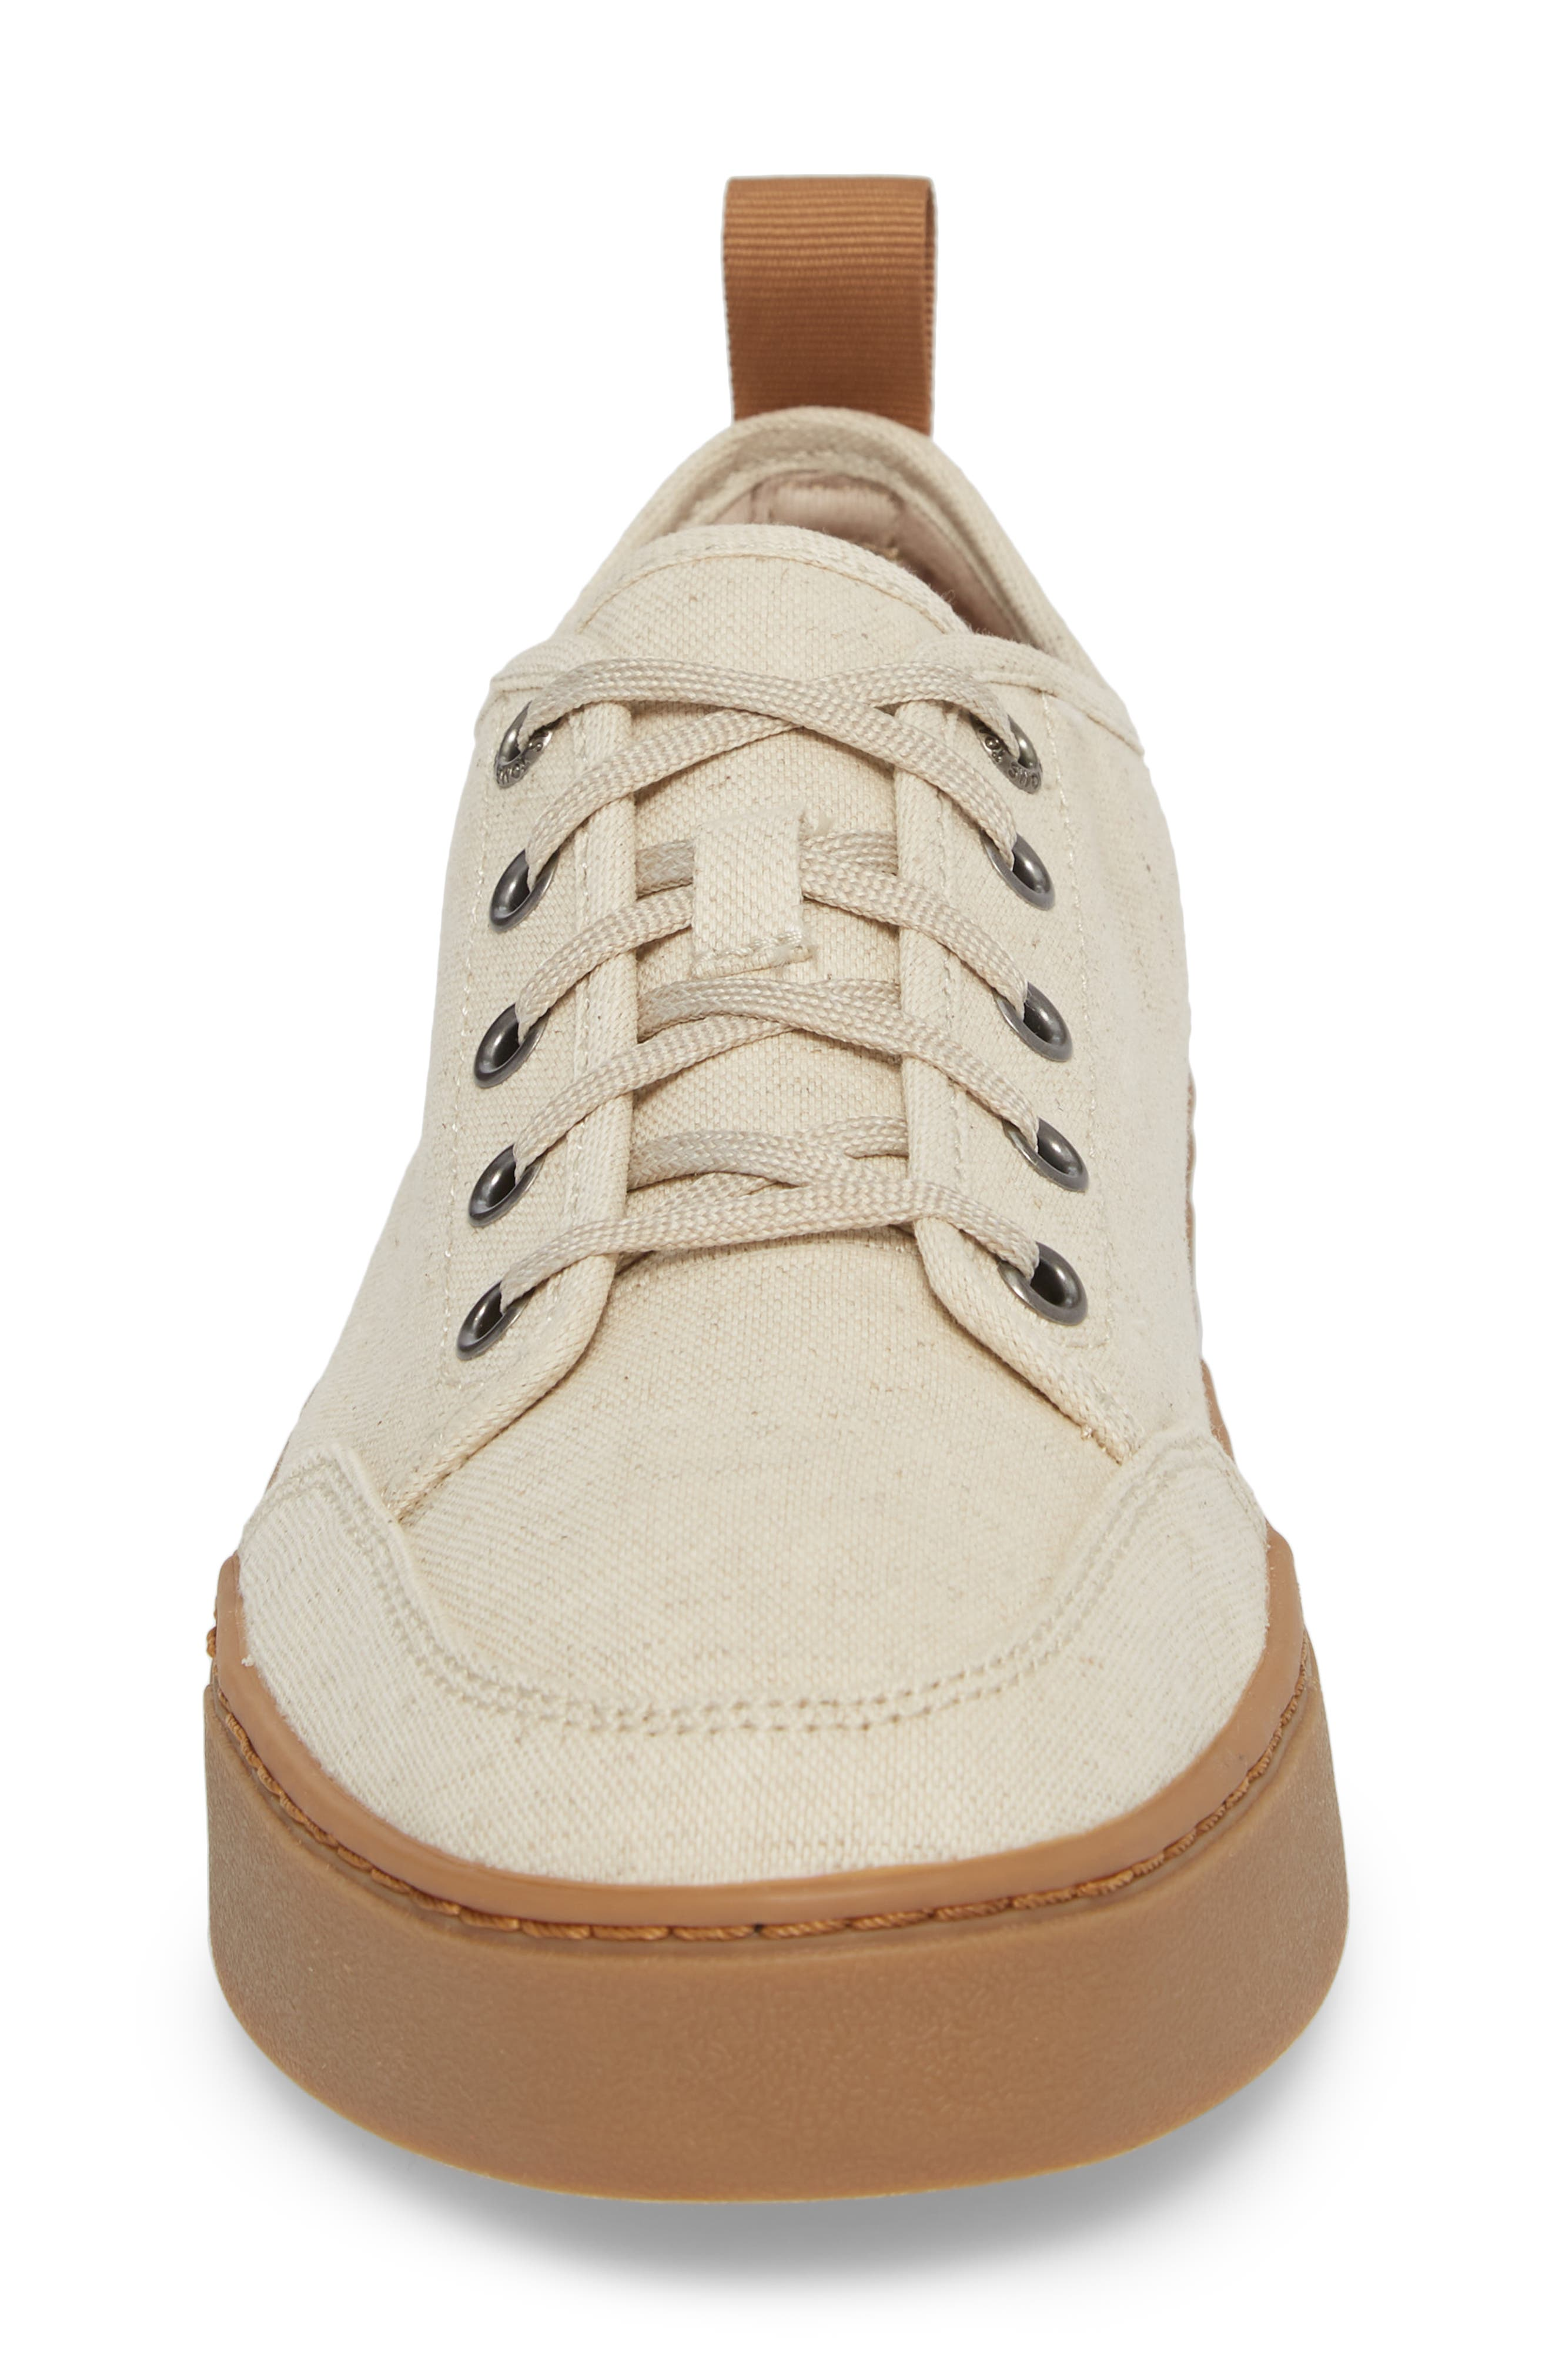 Landen Low Top Sneaker,                             Alternate thumbnail 4, color,                             Natural Hemp/ Gum